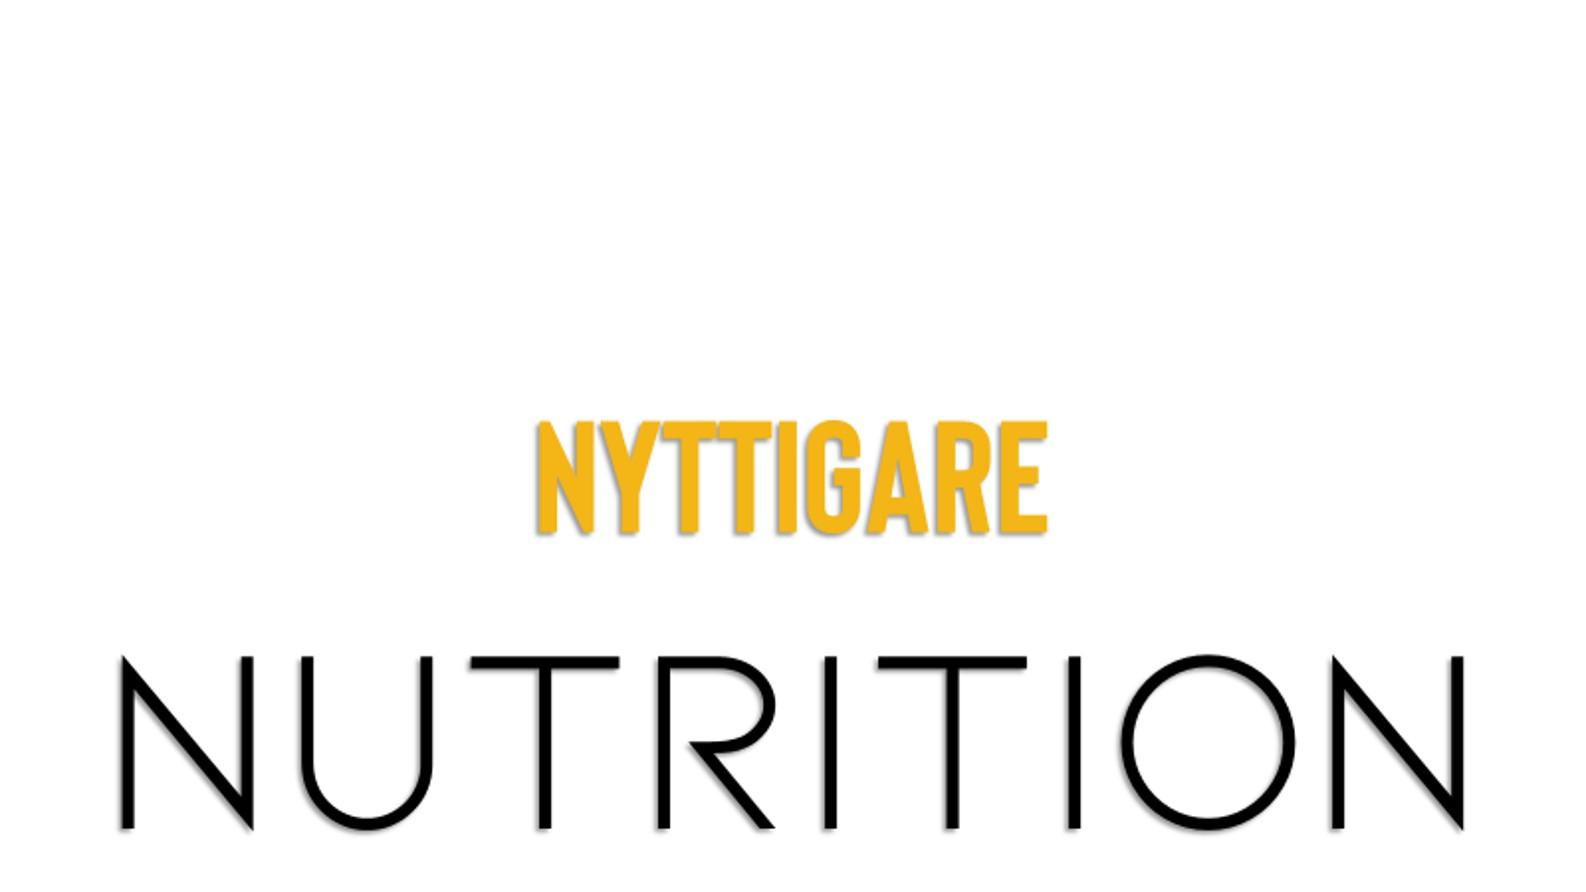 Nyttigare nutrition